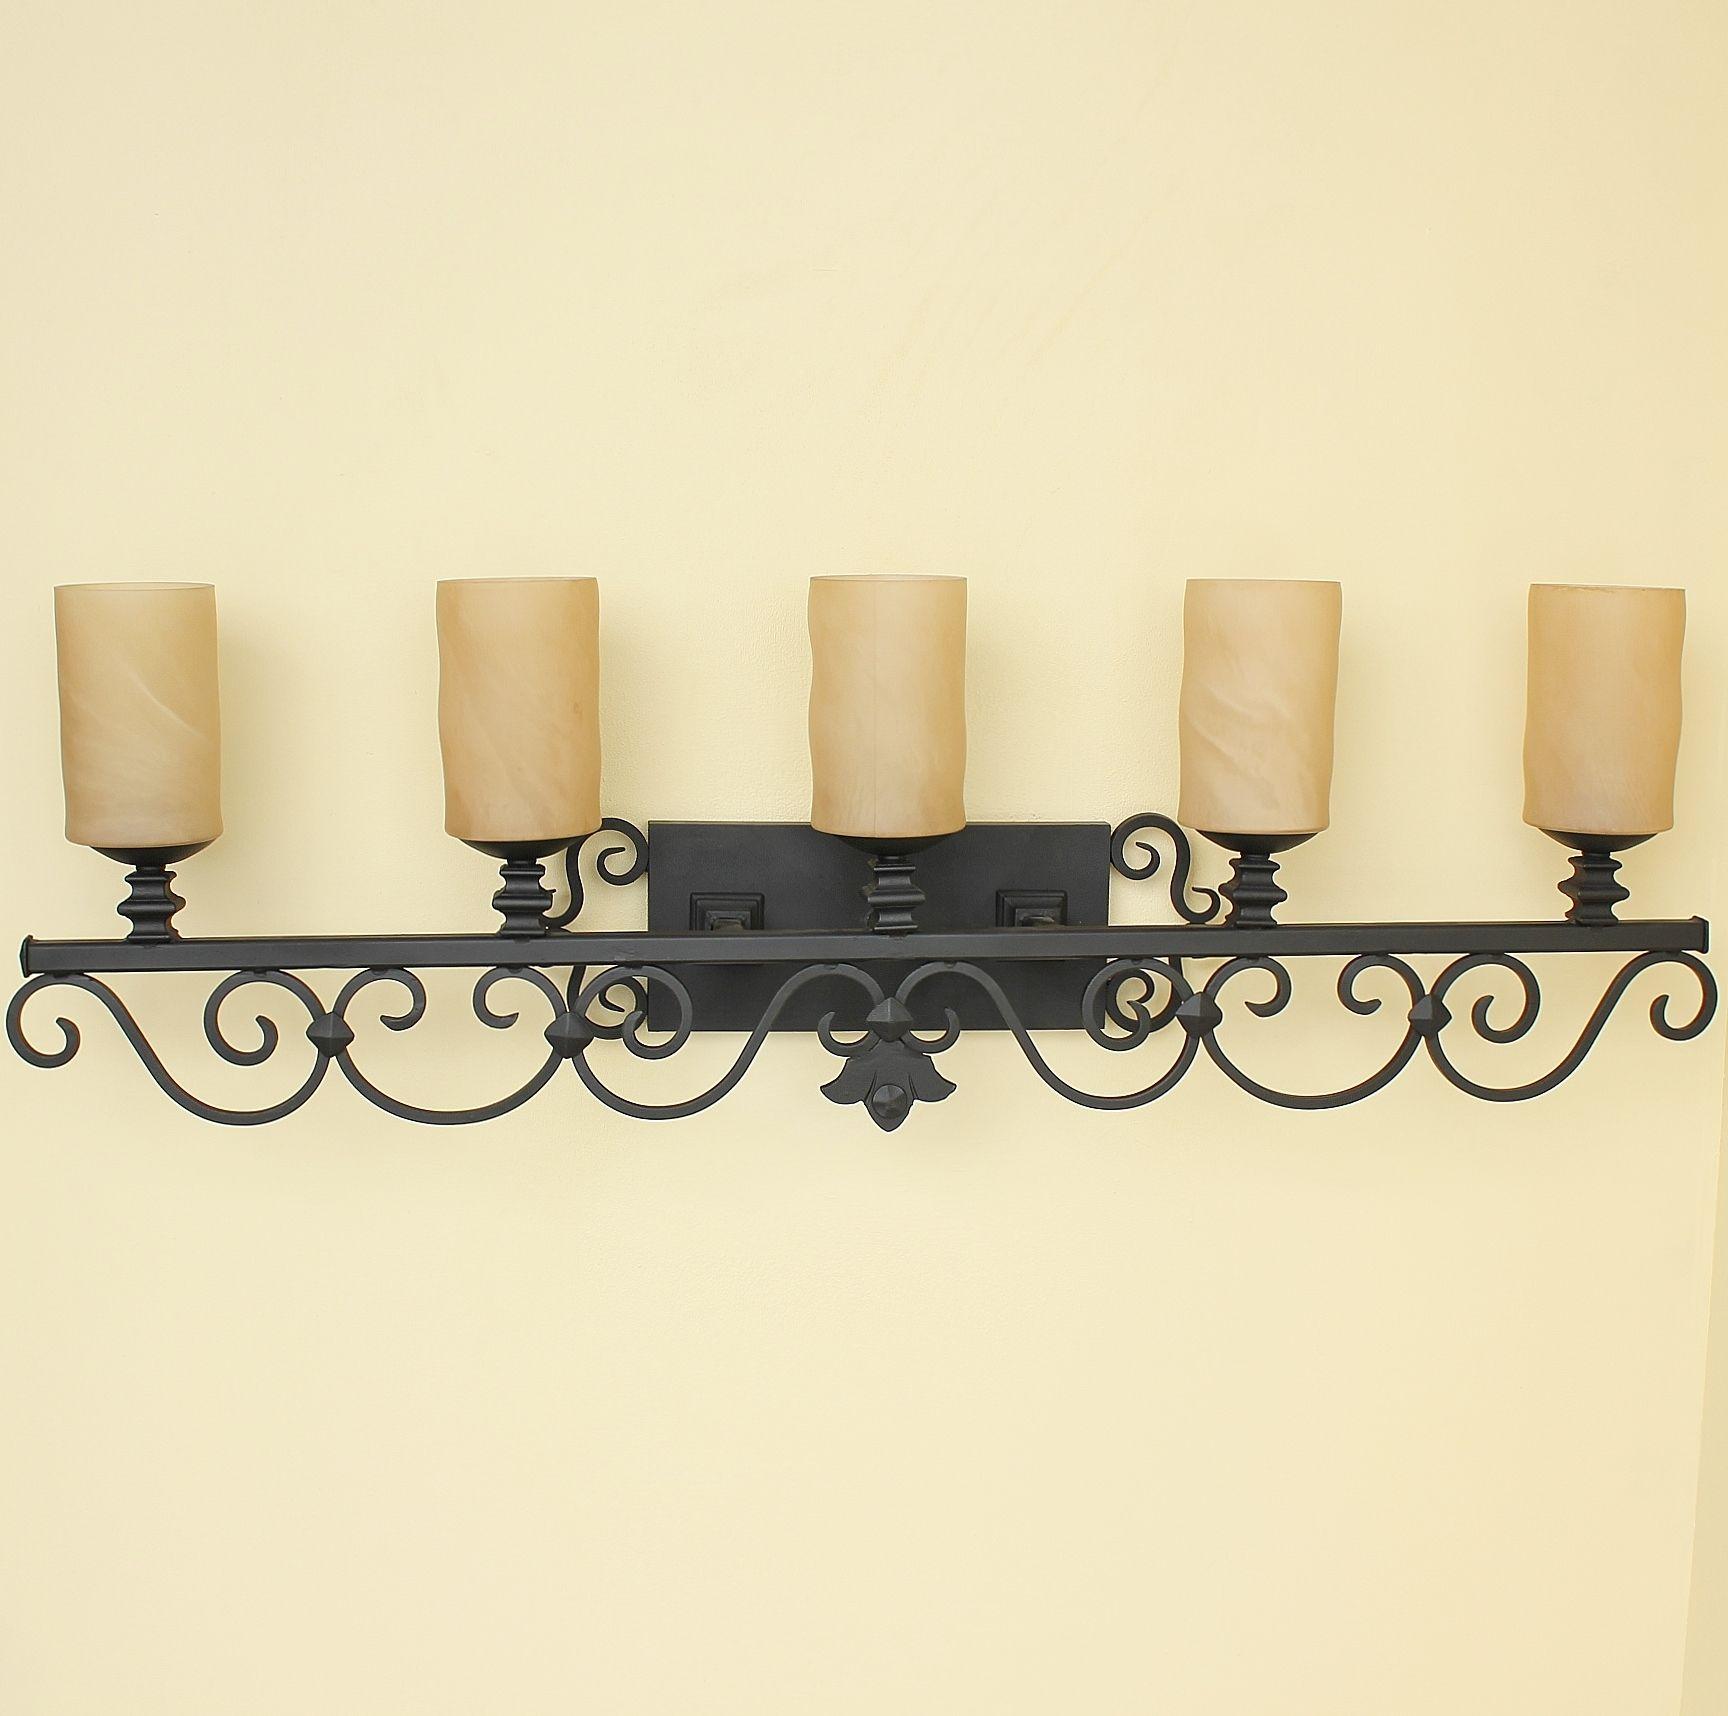 Lights Of Tuscany 5651 5 Tuscan Mediterranean Style Wrought Iron Bathroom Vanity Light